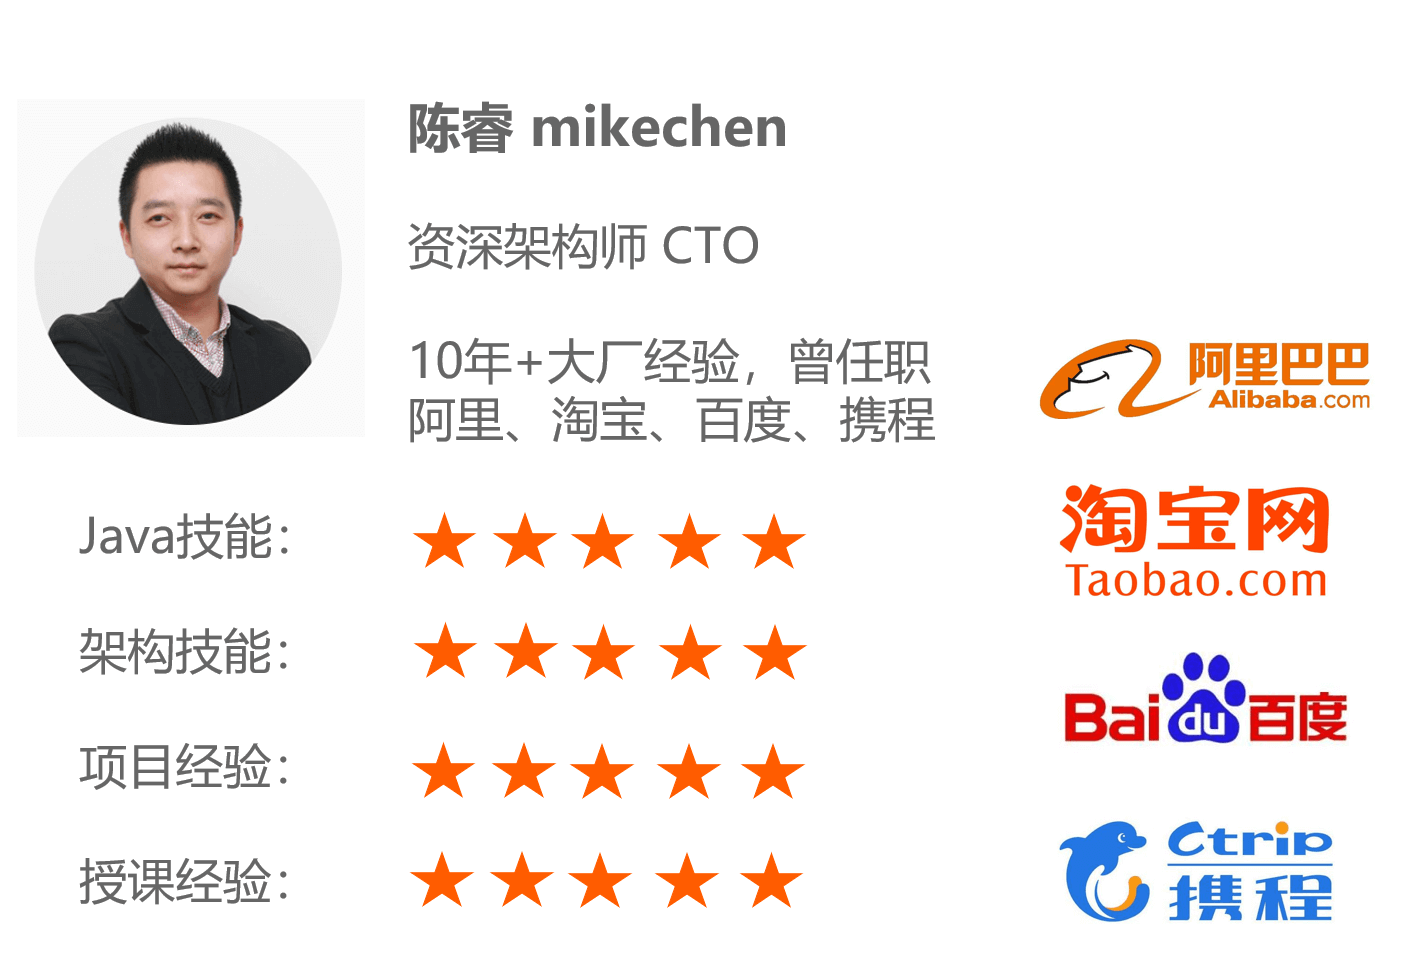 mikechen的互联网架构课-mikechen的互联网架构师之路